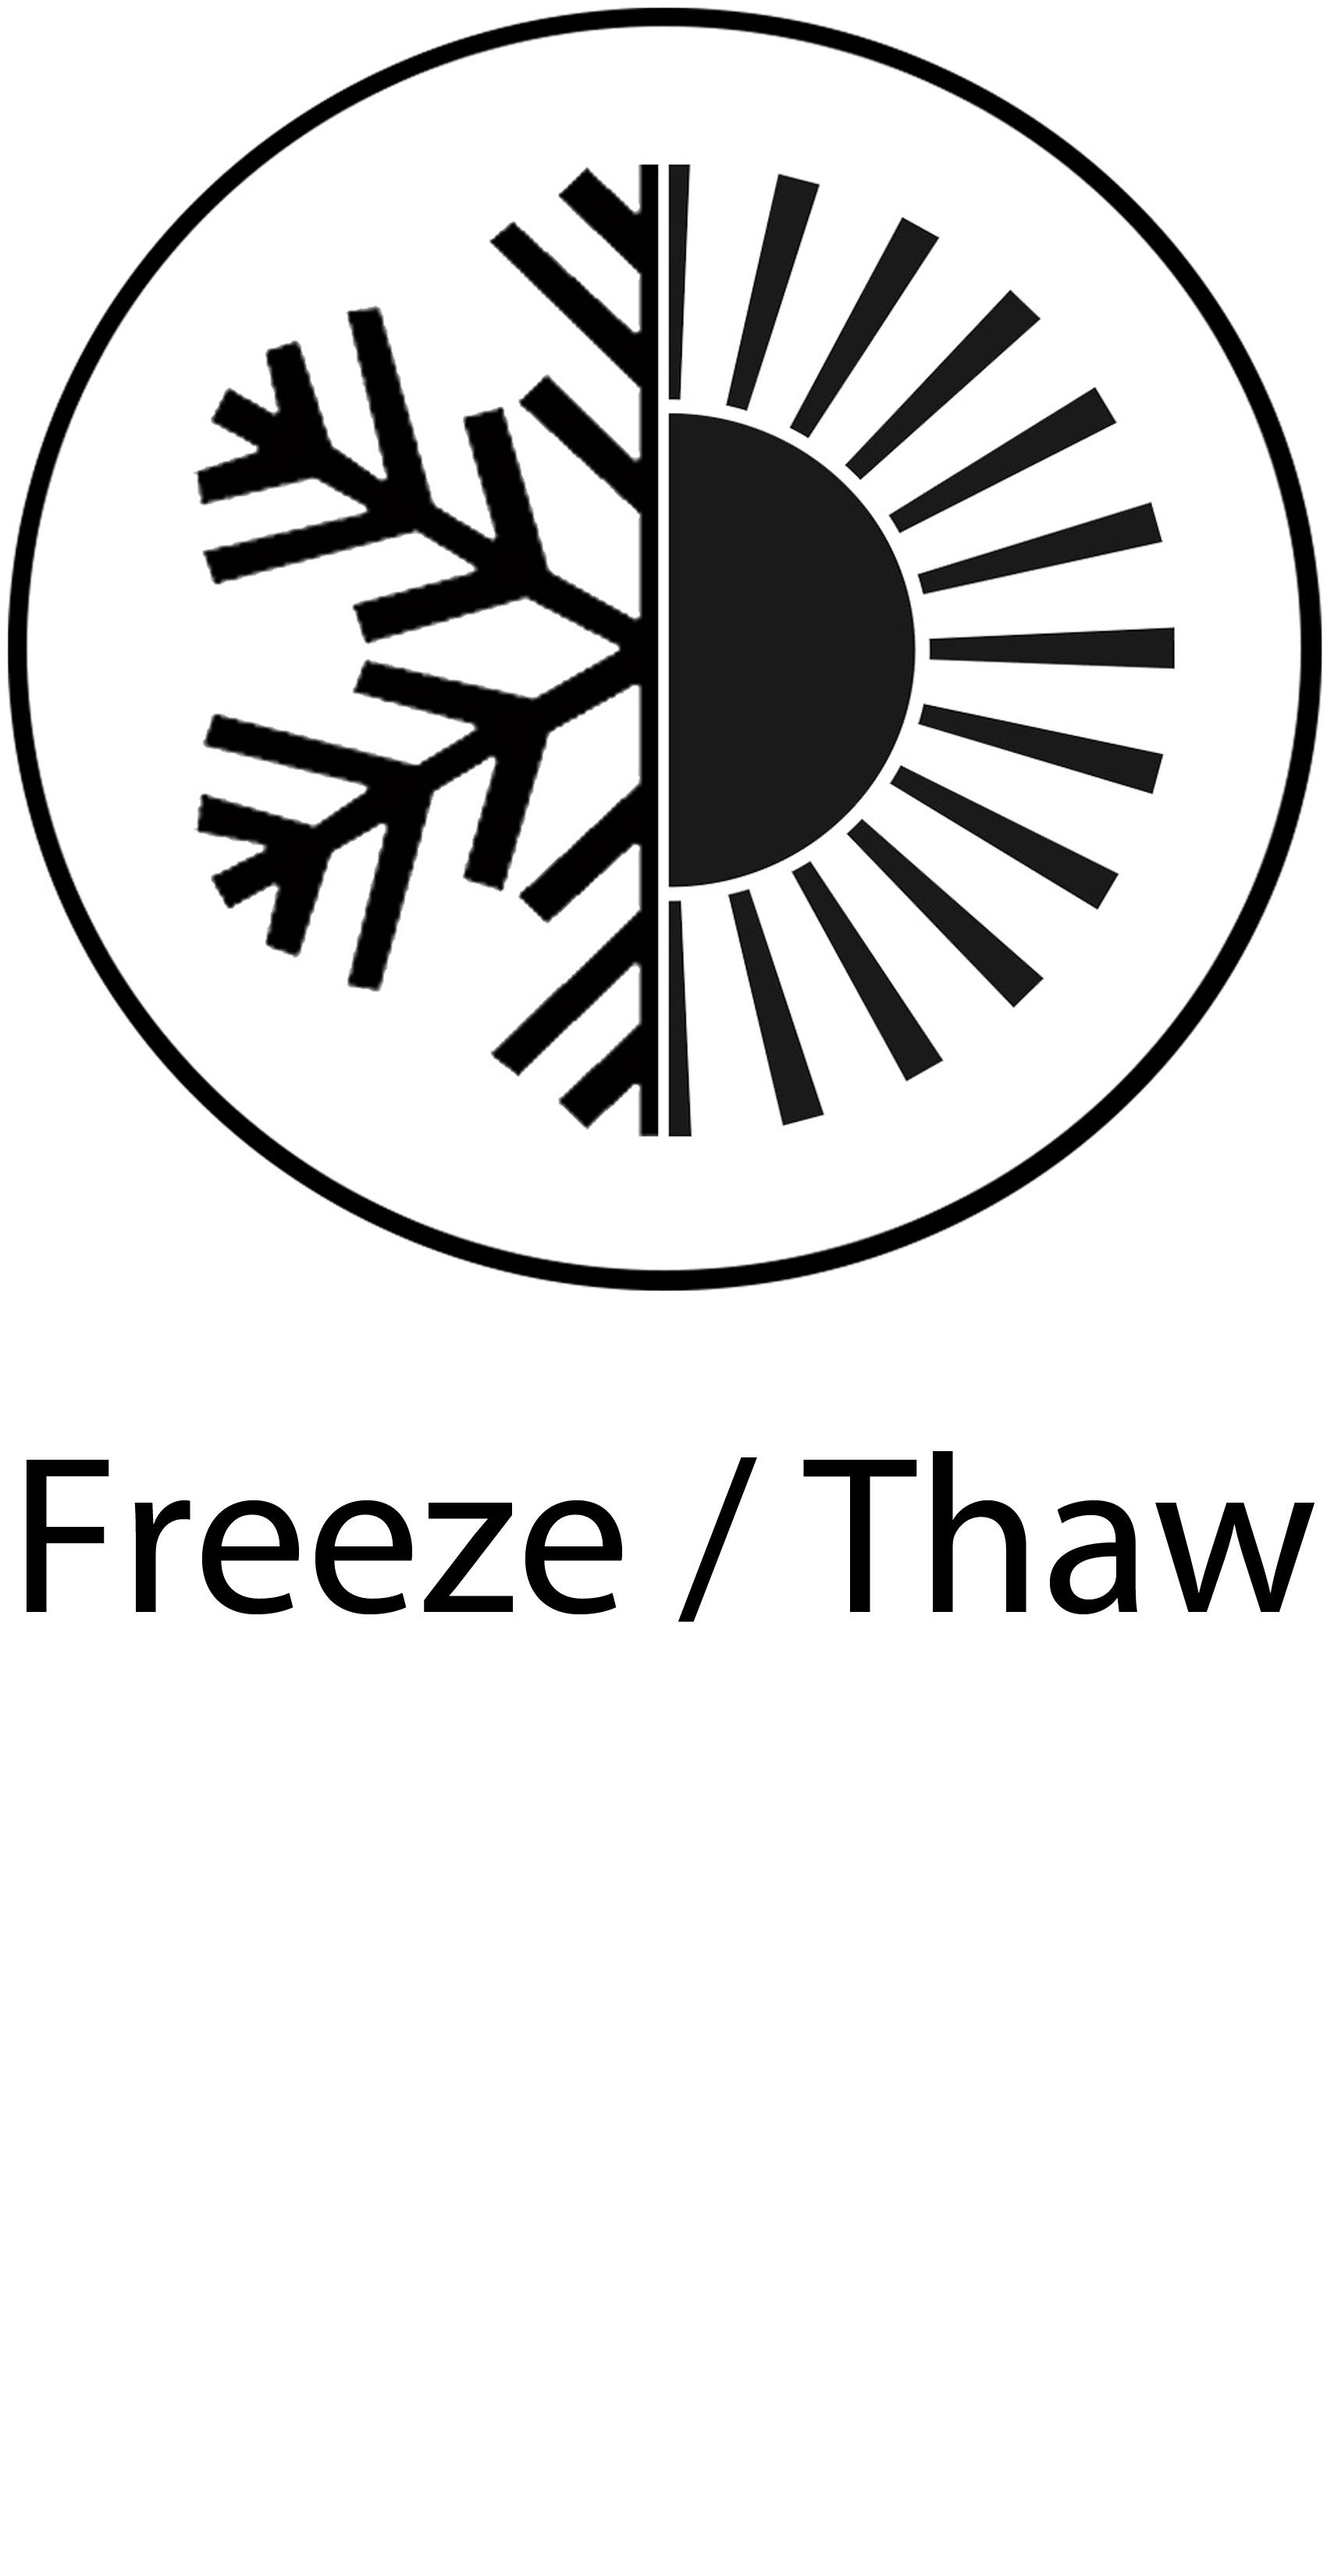 Freeze Thaw.jpg